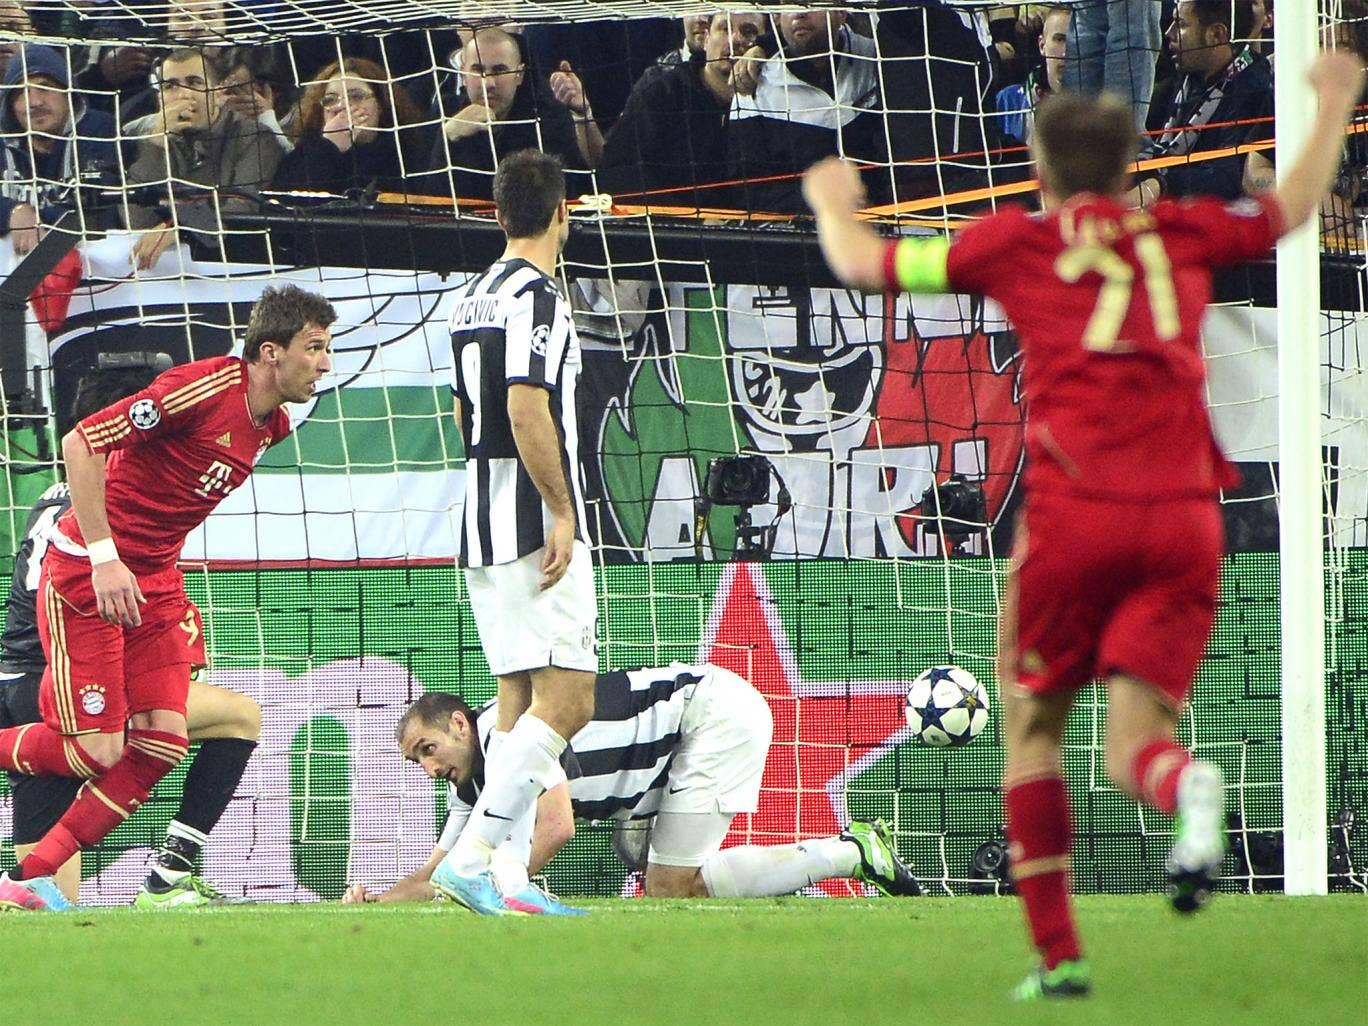 Mario Mandzukic puts the tie beyond Juventus